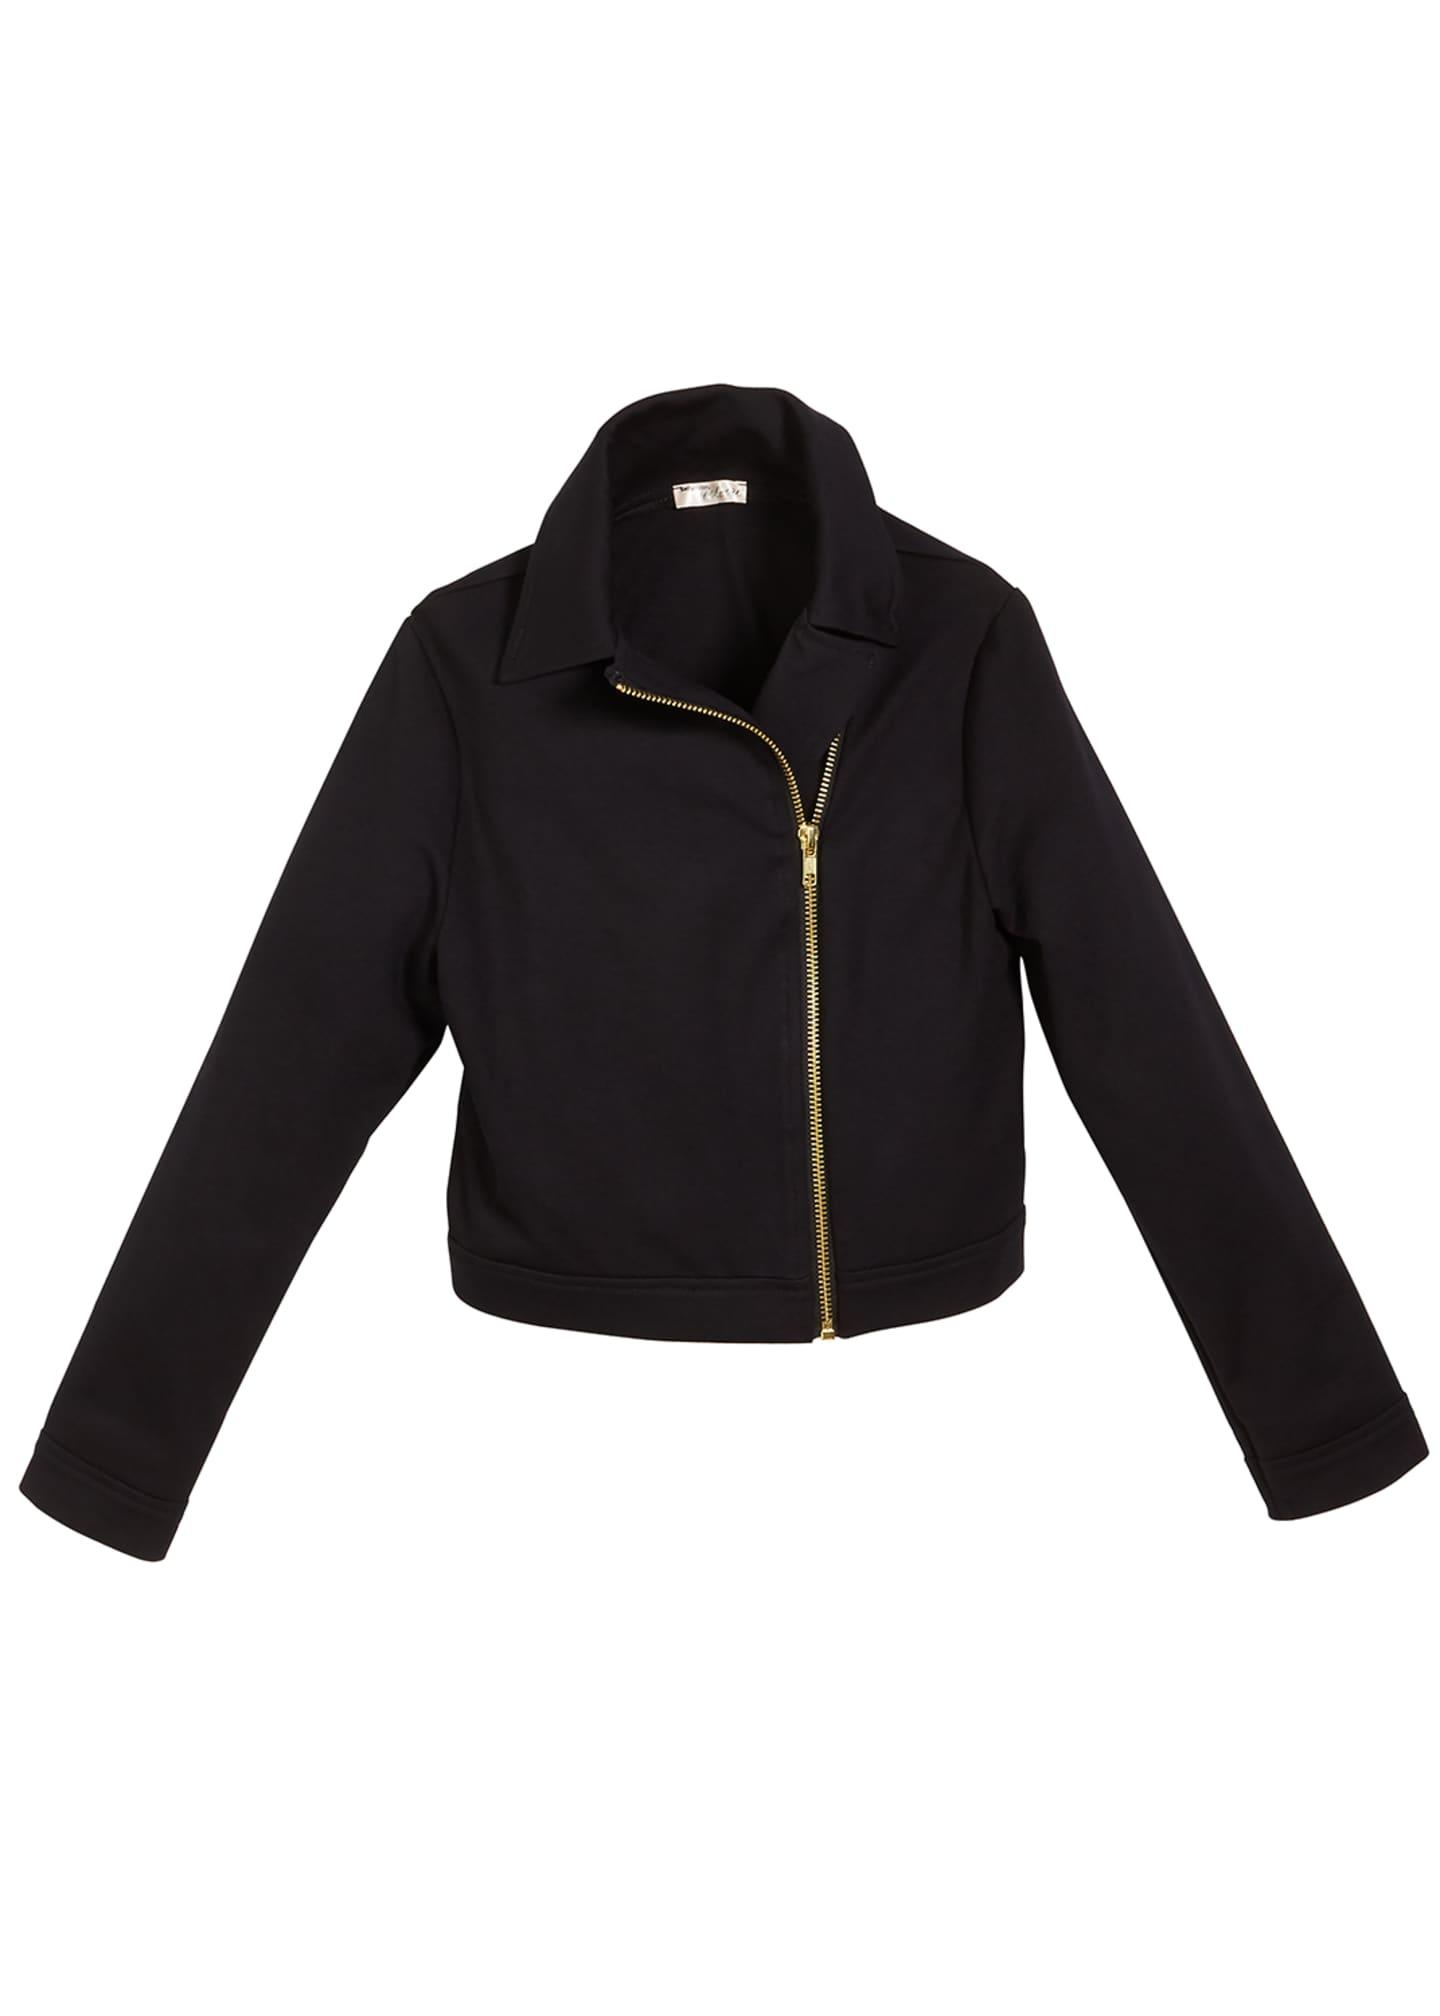 Sally Miller The Moto Jacket, Size S-XL